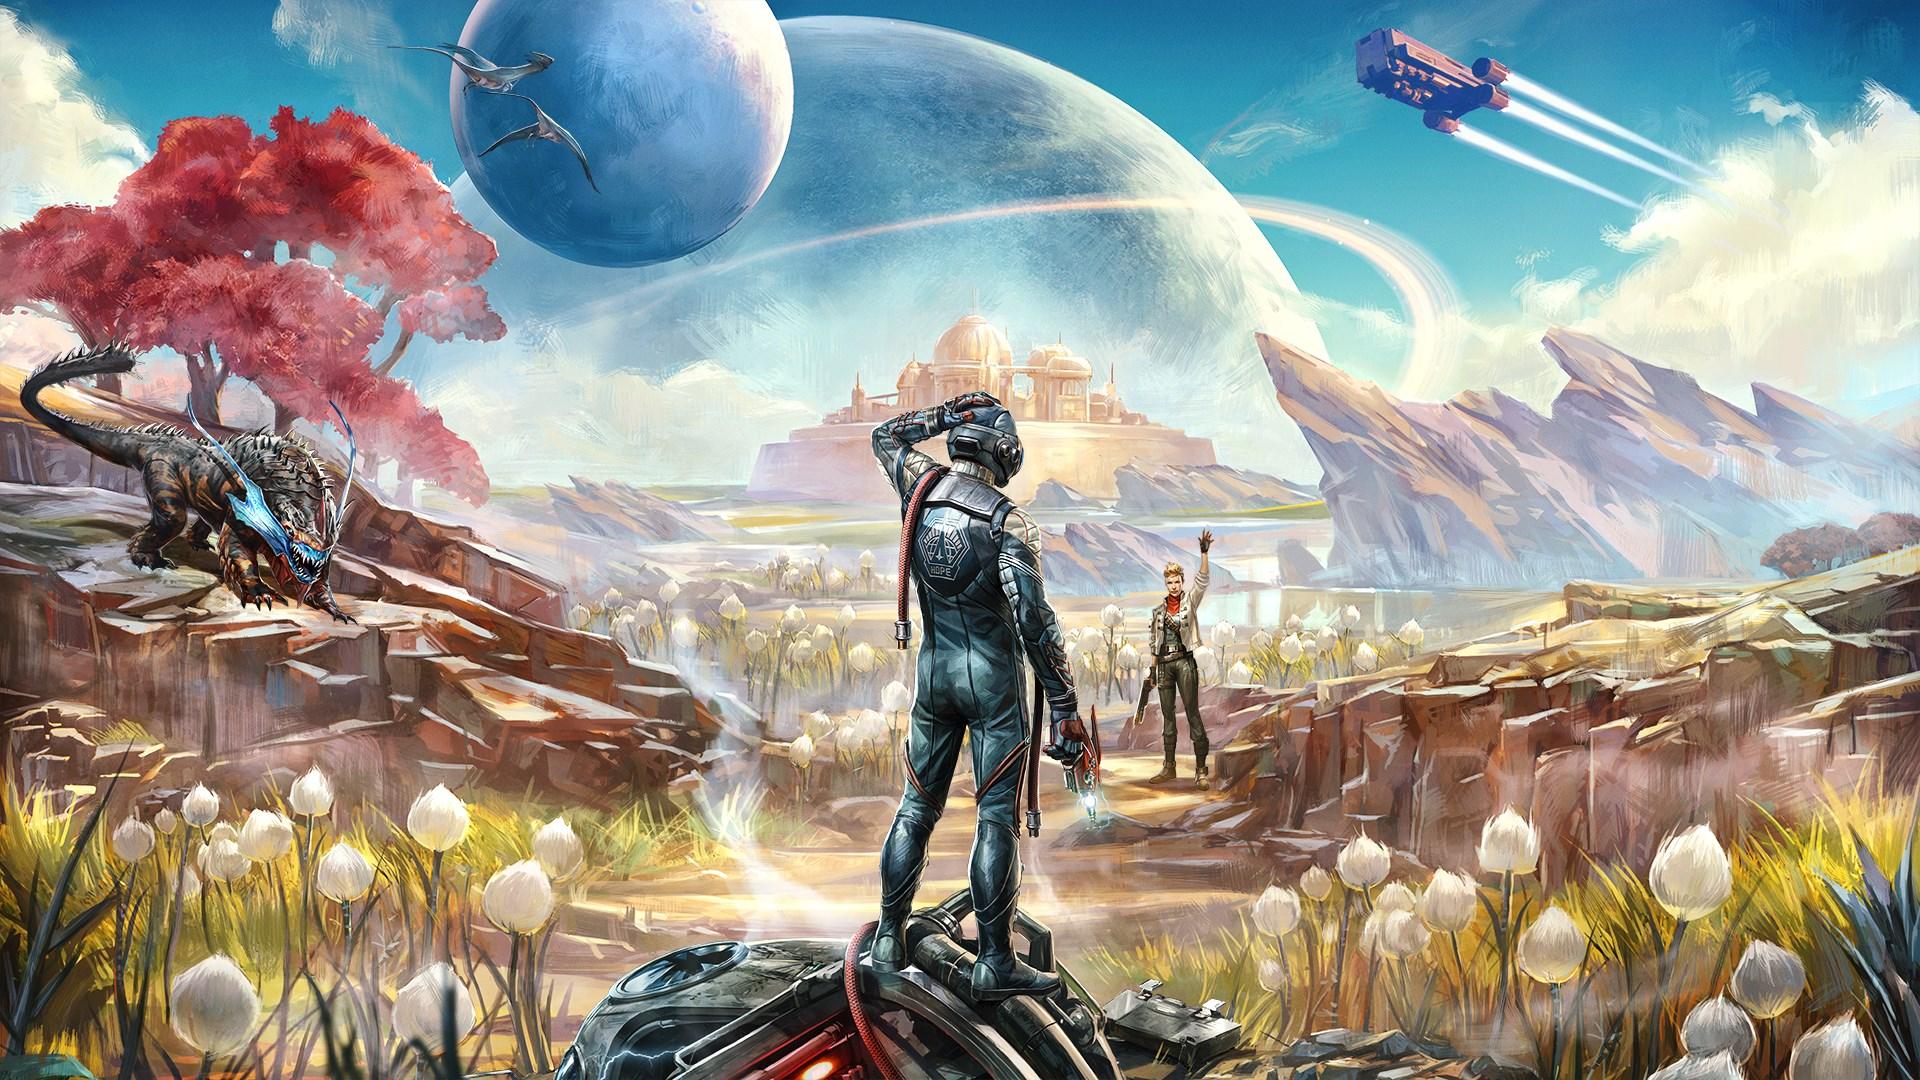 The Outer Worlds | استودیوی آبسیدین به دنبال عرضهی یک بازی بدون باگ است